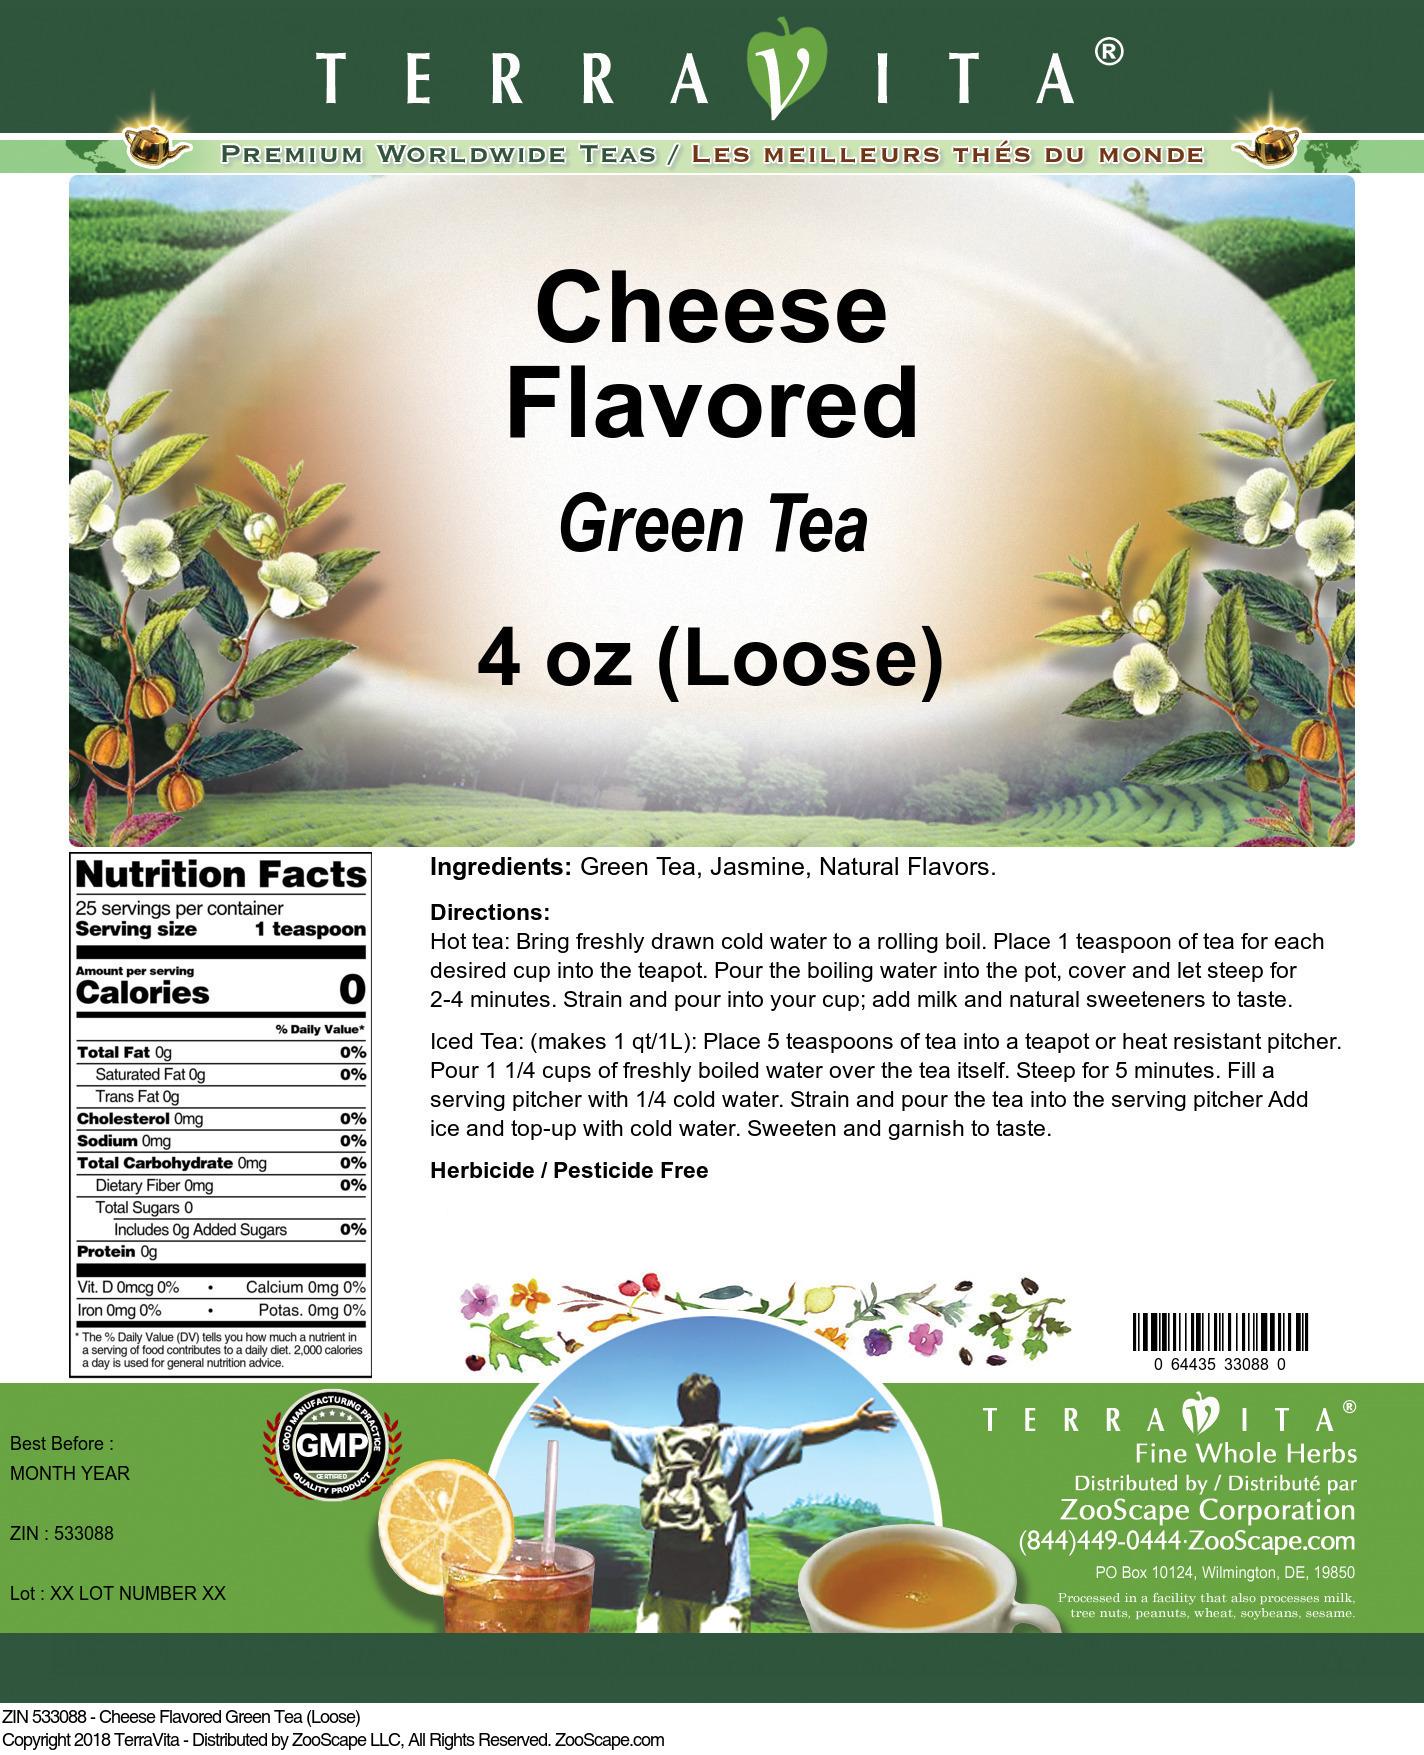 Cheese Flavored Green Tea (Loose)